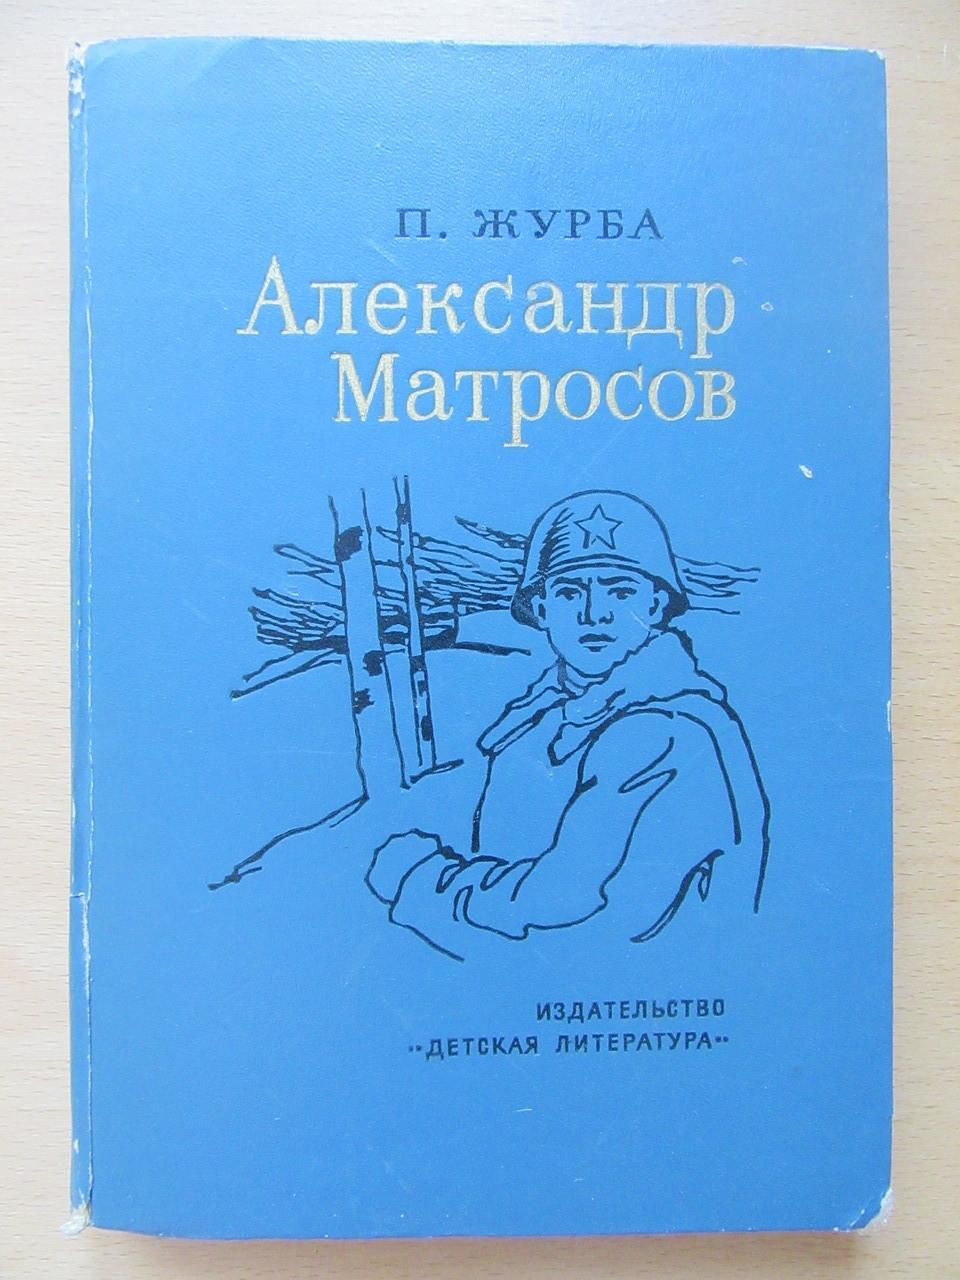 П. Журба. Олександр Матросов